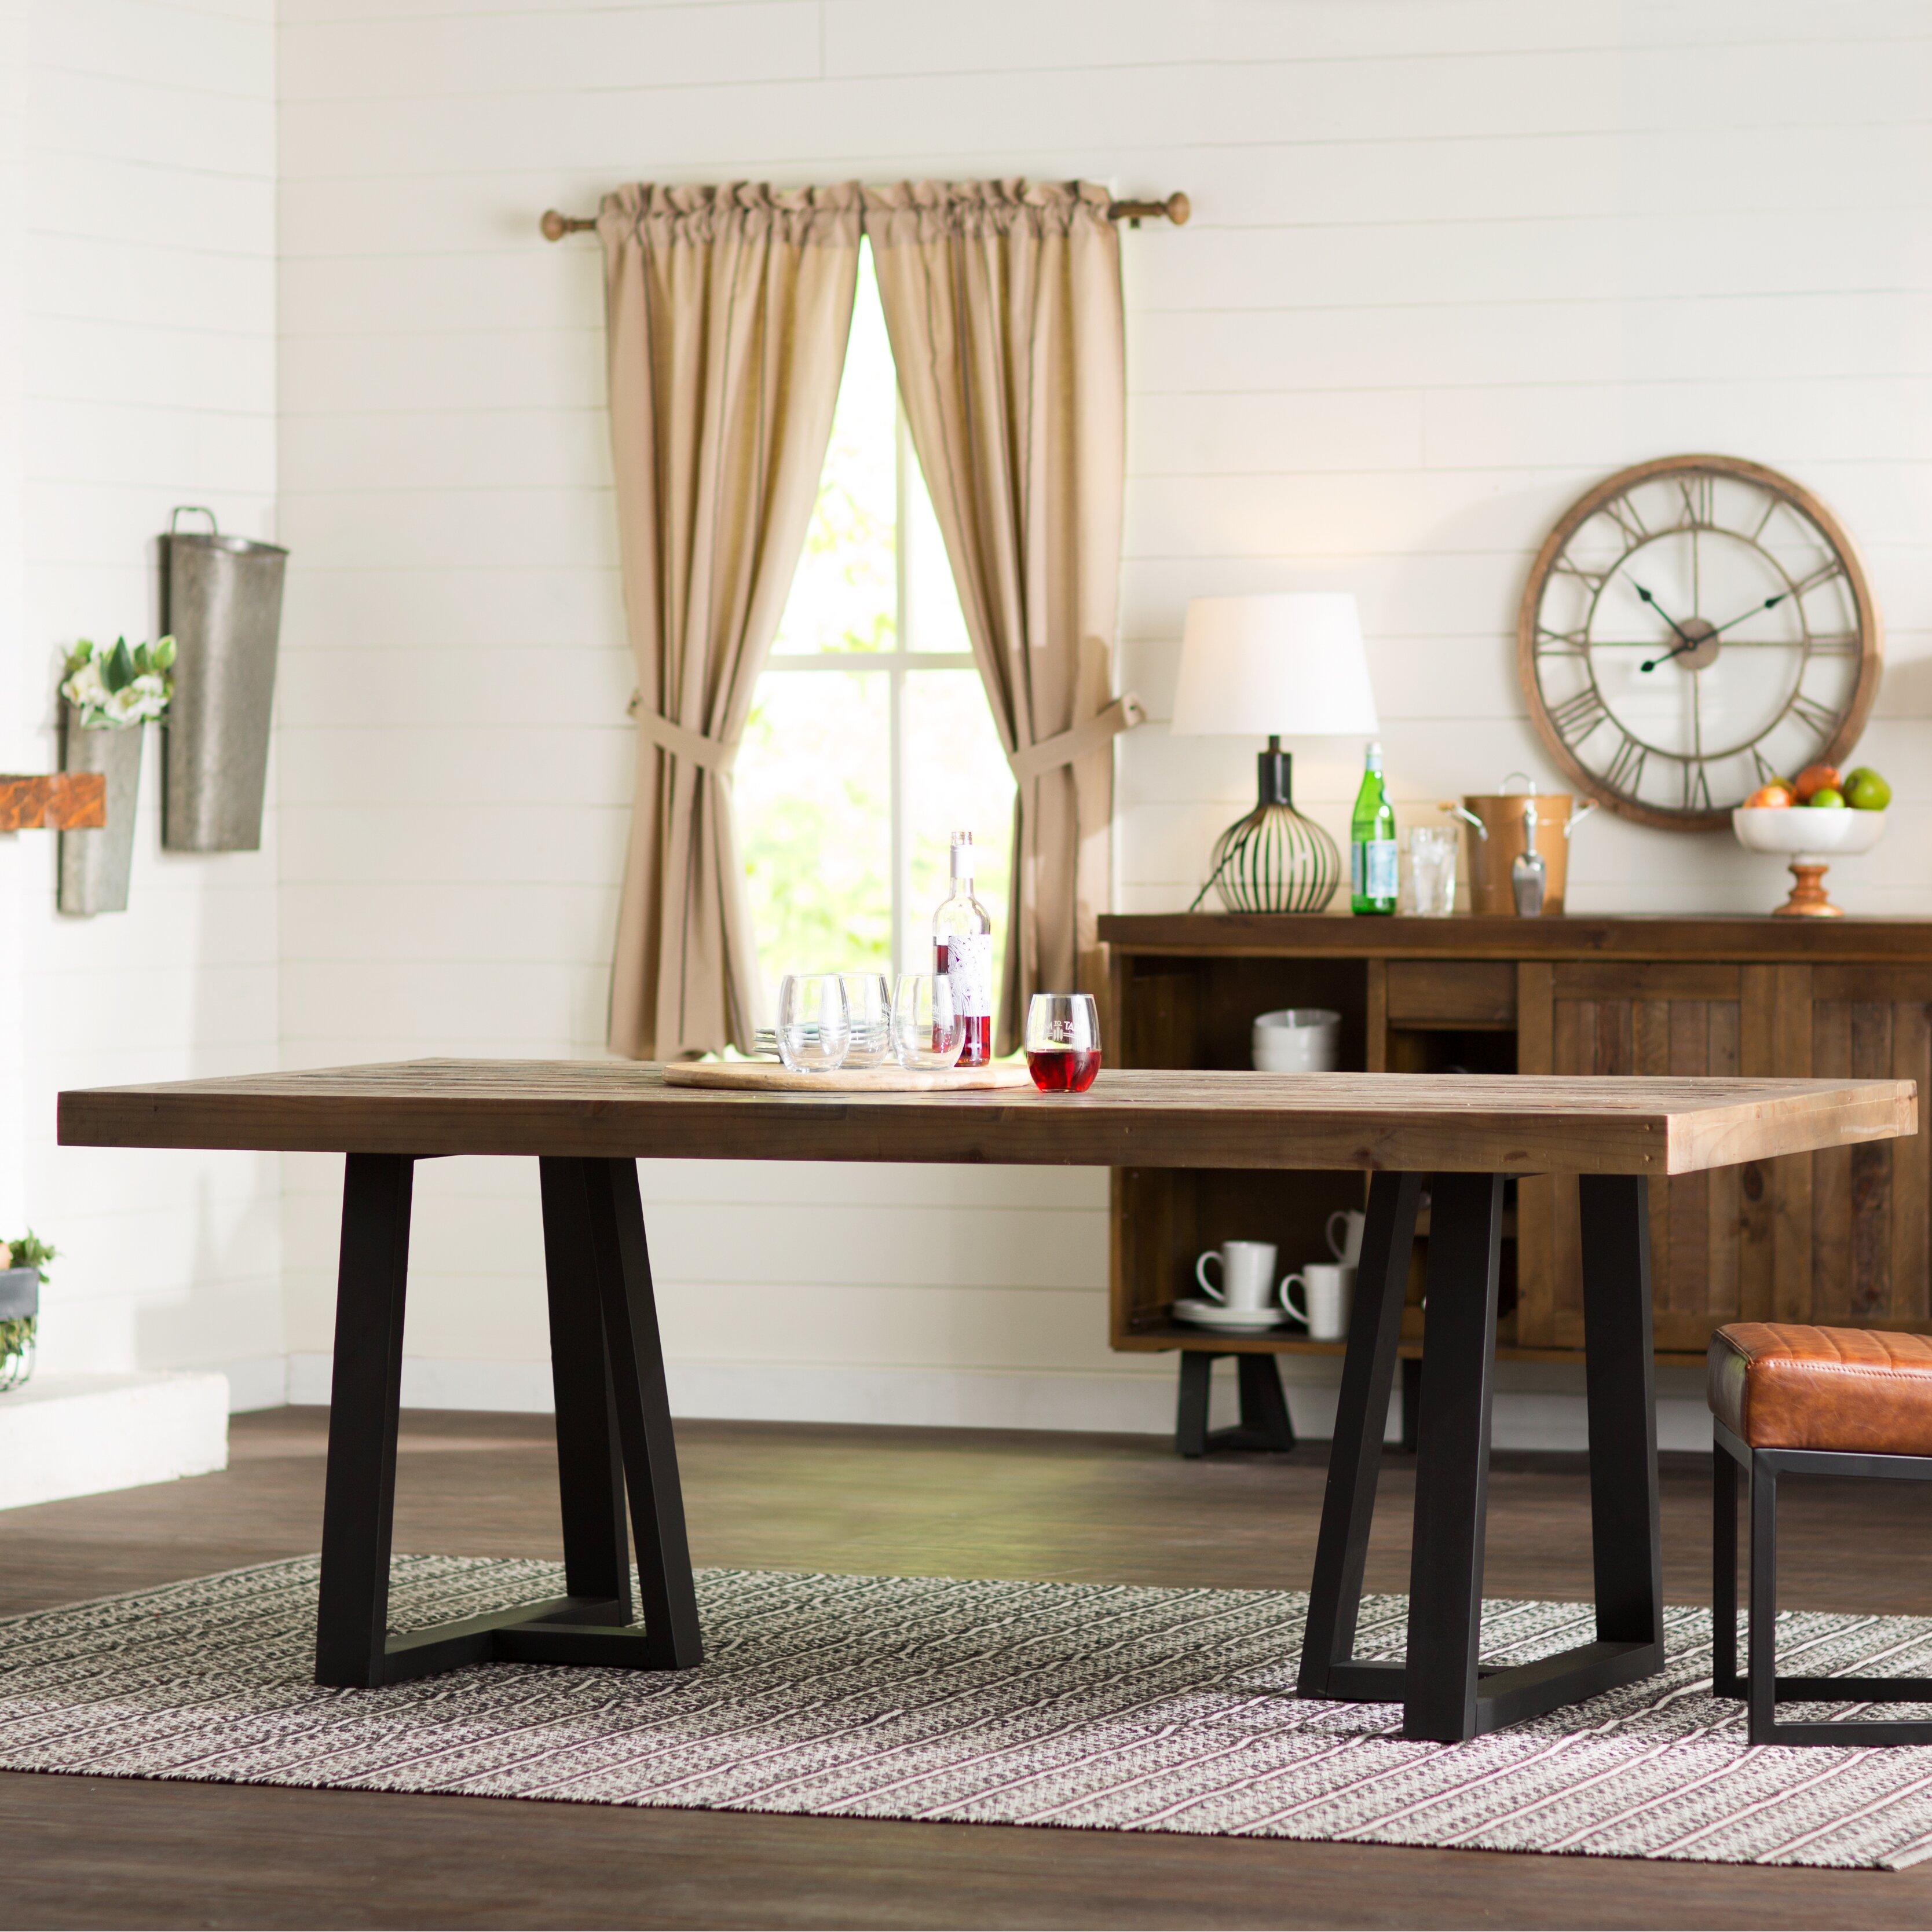 Laurel Foundry Modern Farmhouse Living Room: Laurel Foundry Modern Farmhouse™ Adell 6 Piece Dining Set